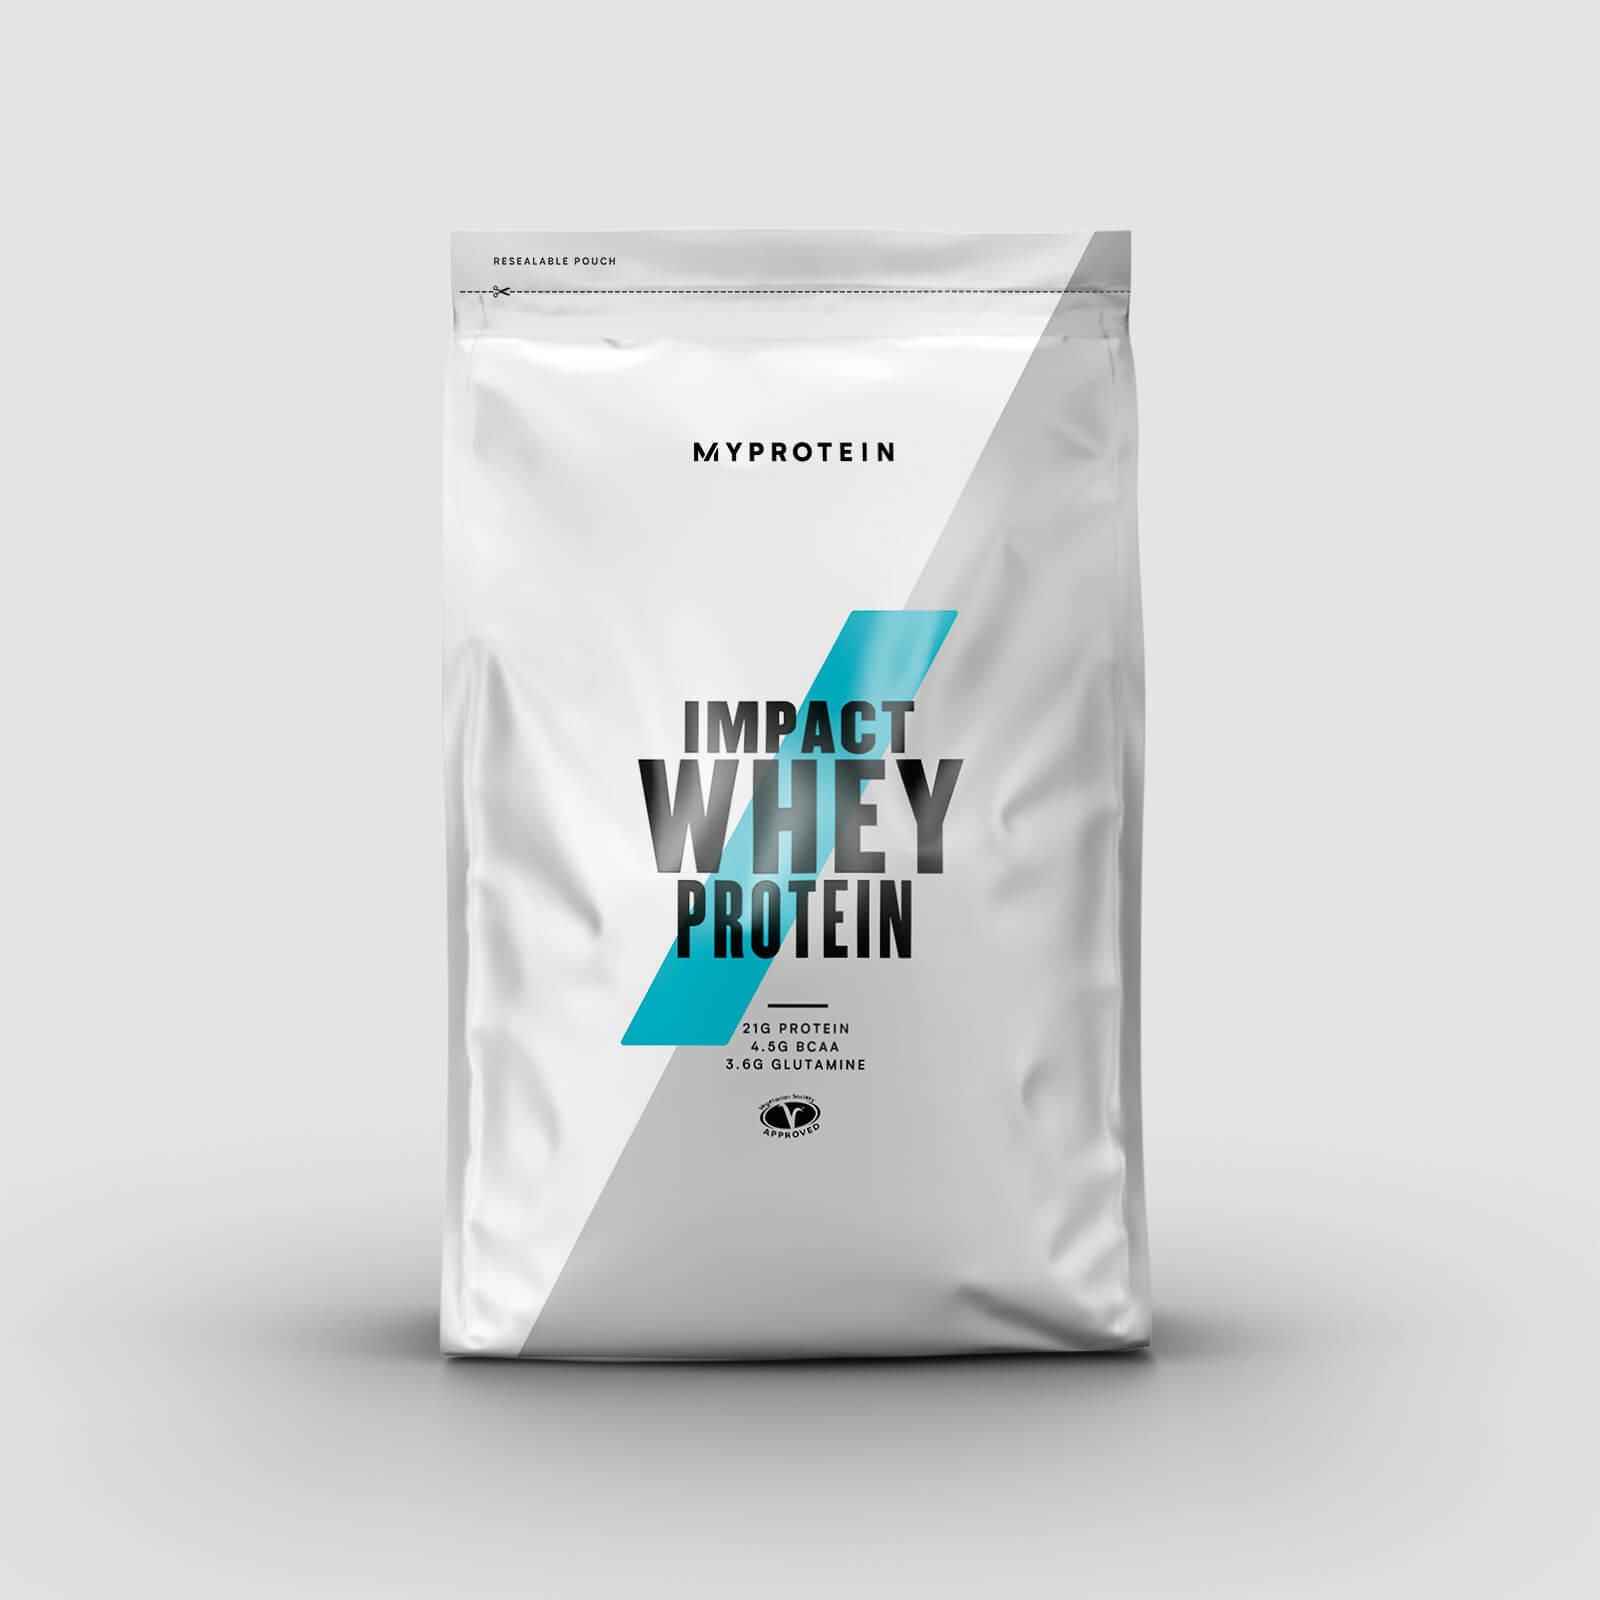 Myprotein Impact Whey Protein - 1kg - Sirop d'érable